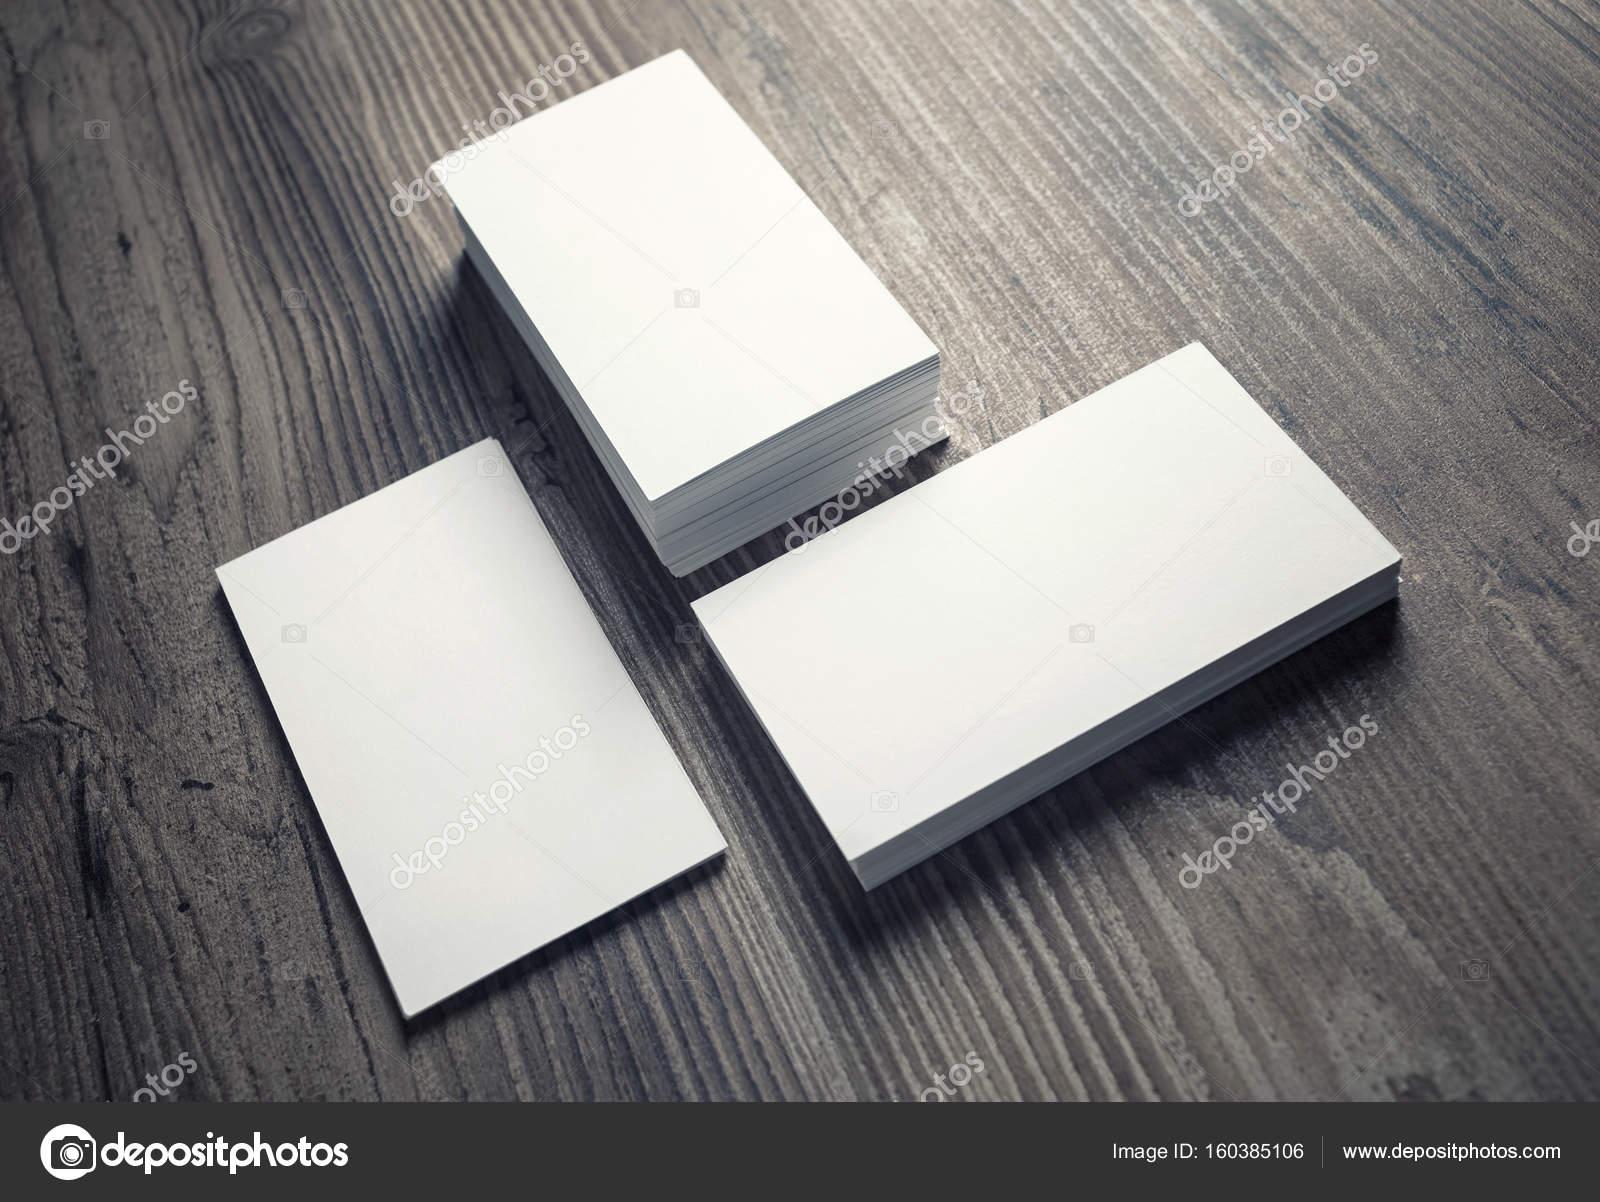 Piles of blank business cards — Stock Photo © Veresovich #160385106